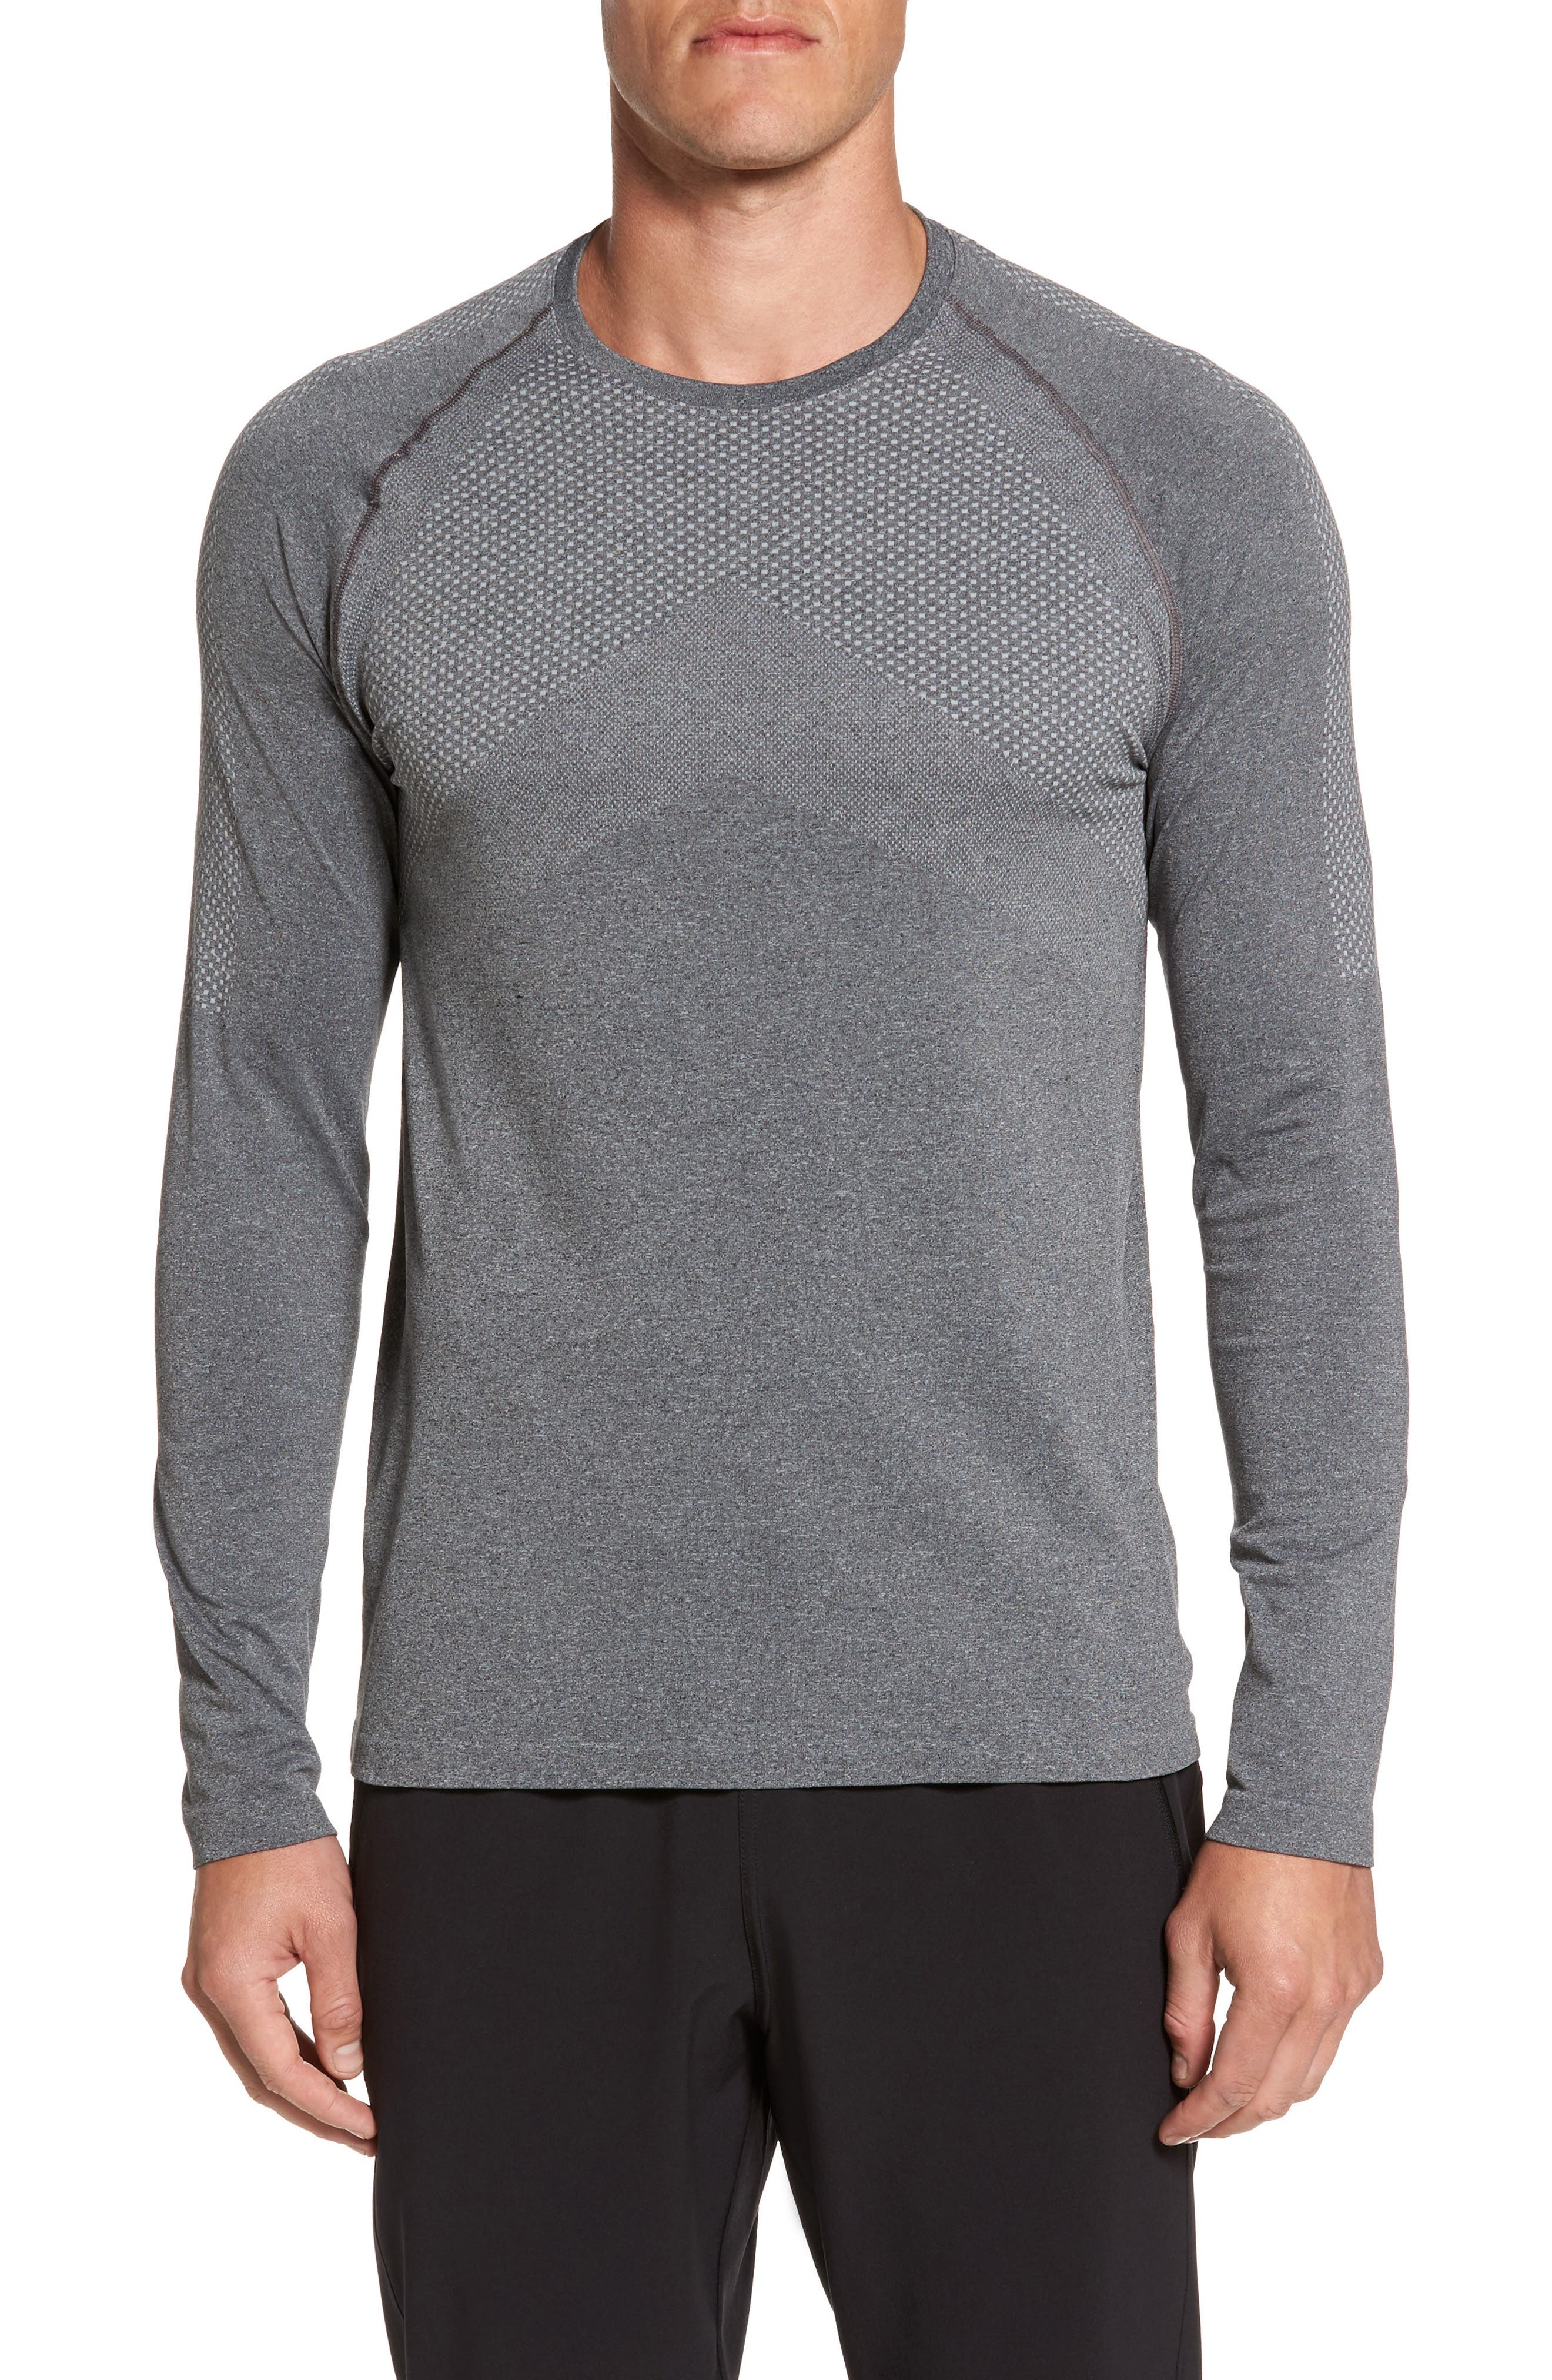 Zeolite Long Sleeve Performance T-Shirt,                             Main thumbnail 1, color,                             050